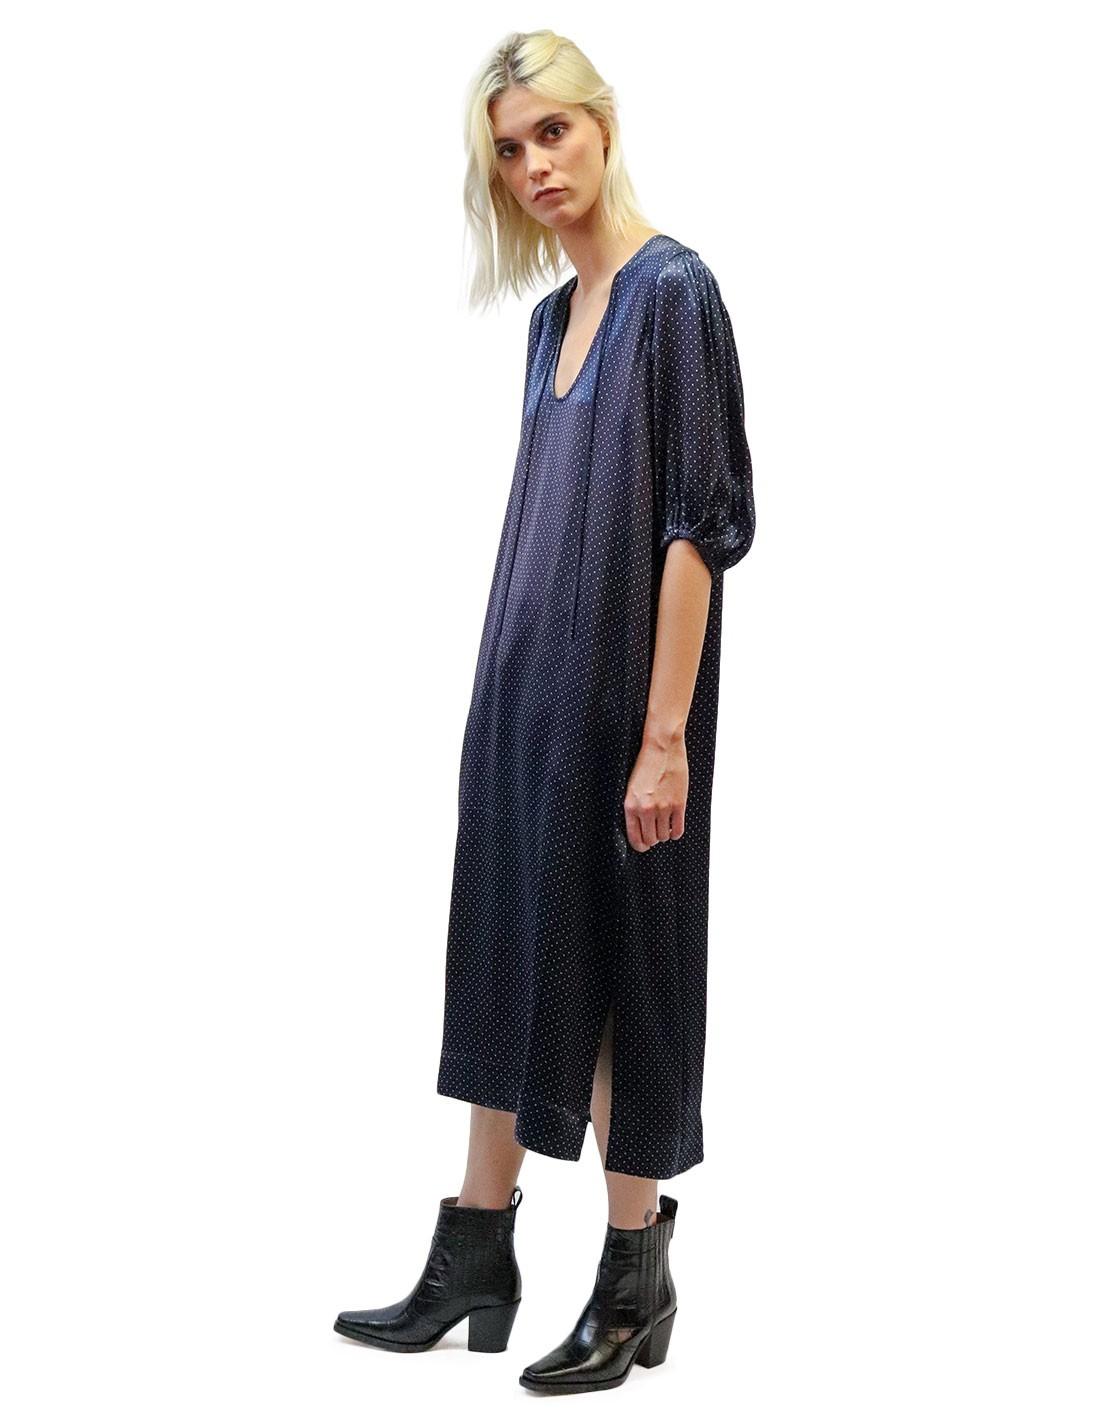 Robe Longue Bleu Marine A Pois